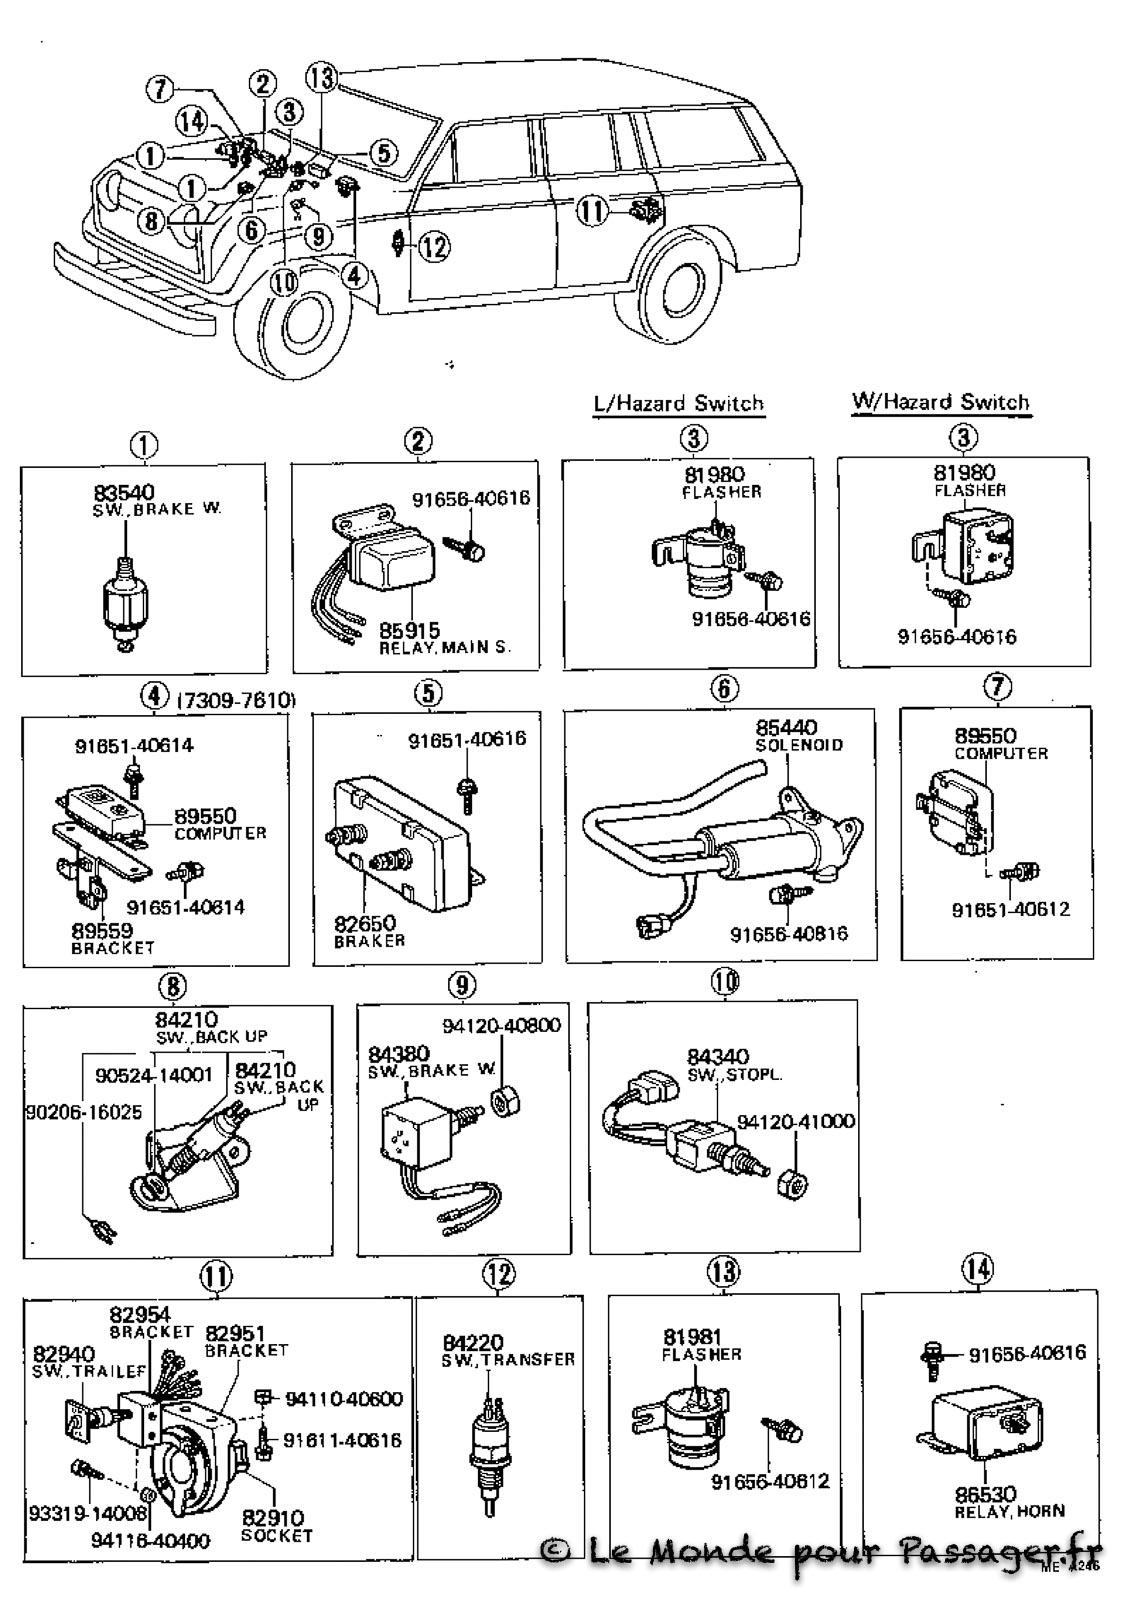 Fj55-Eclatés-Techniques111